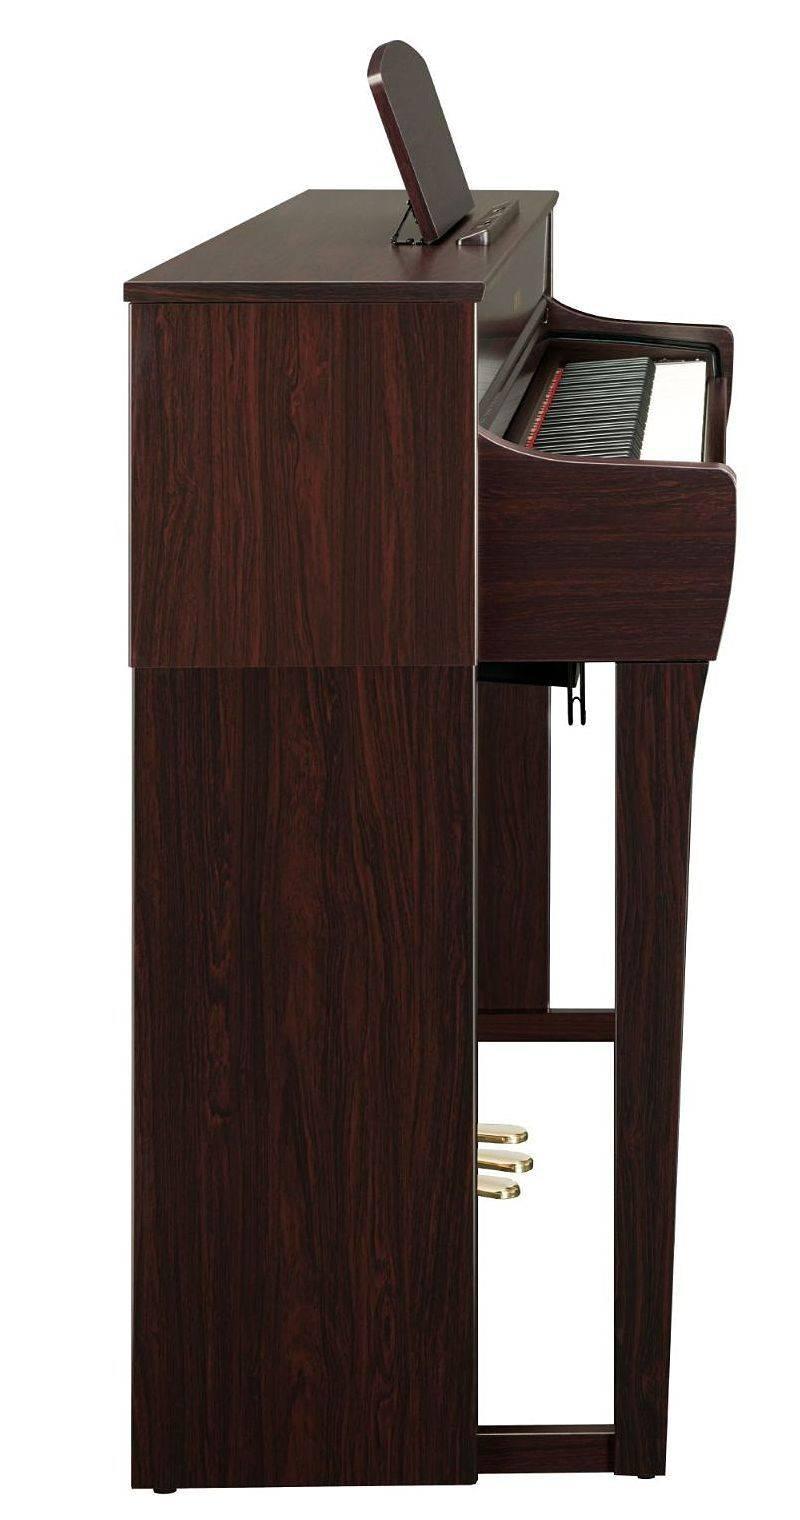 Piano Clavinova Yamaha CLP-735R Rosewood